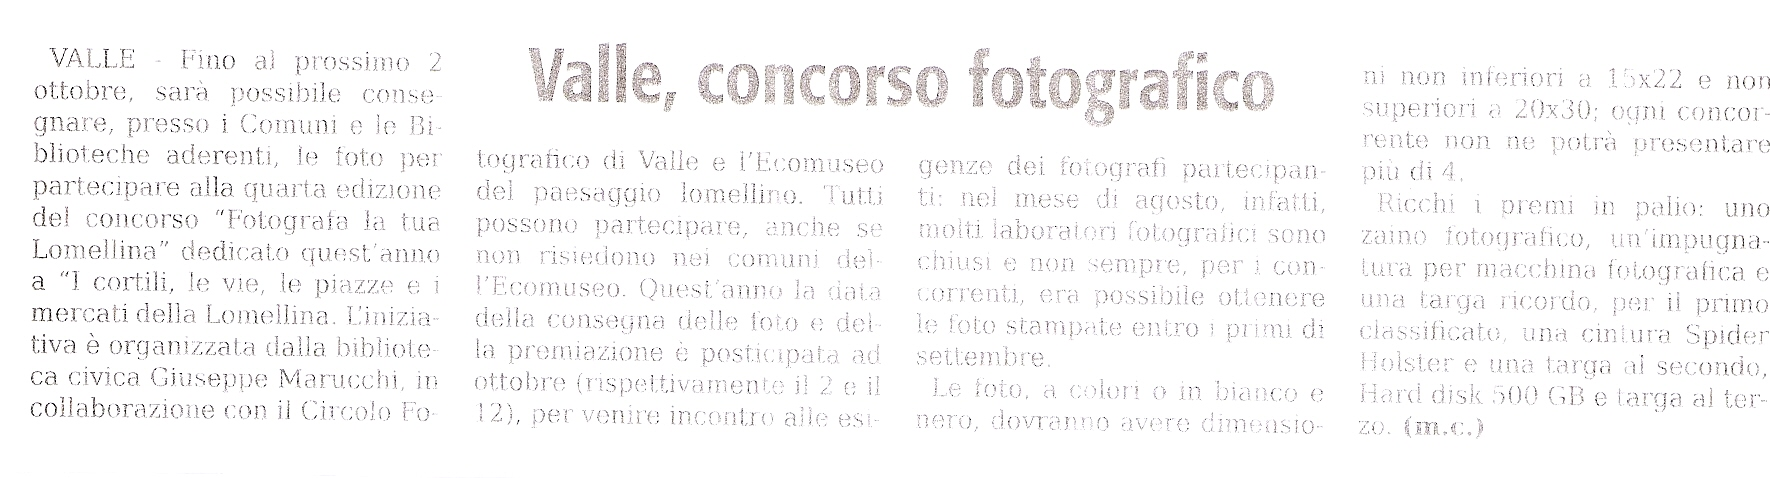 2013-07-31 Informatore lom